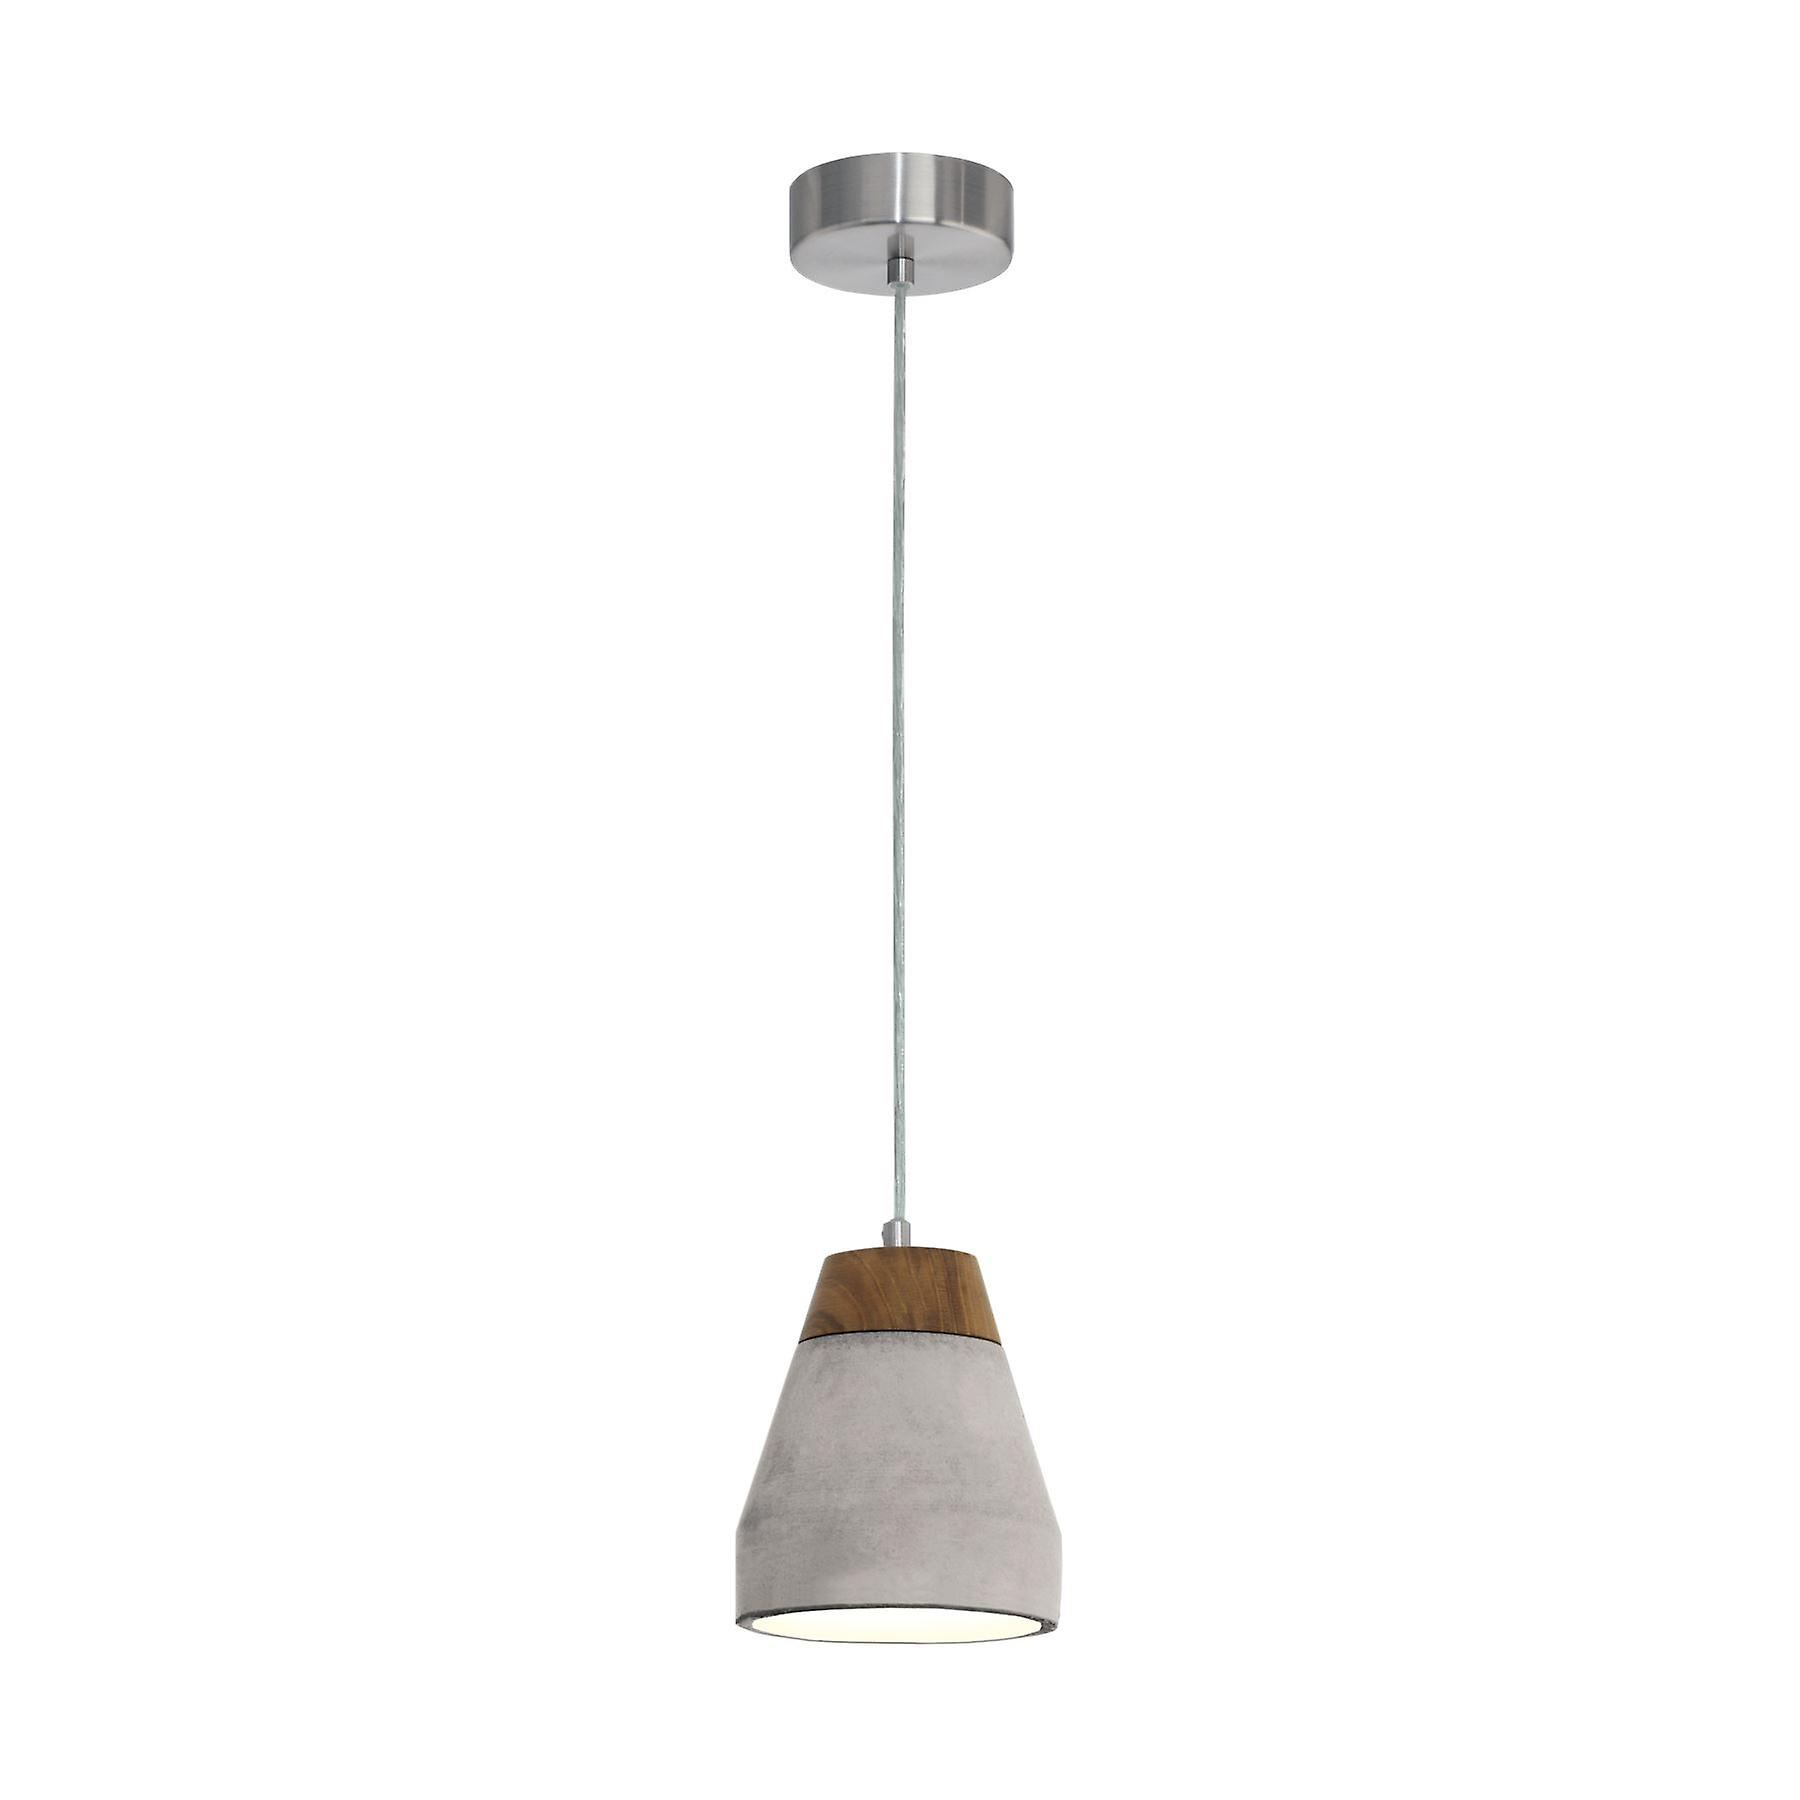 Eglo - Tarega Single lumière Ceiling pendentif In gris Concrete And bois Finish EG95525